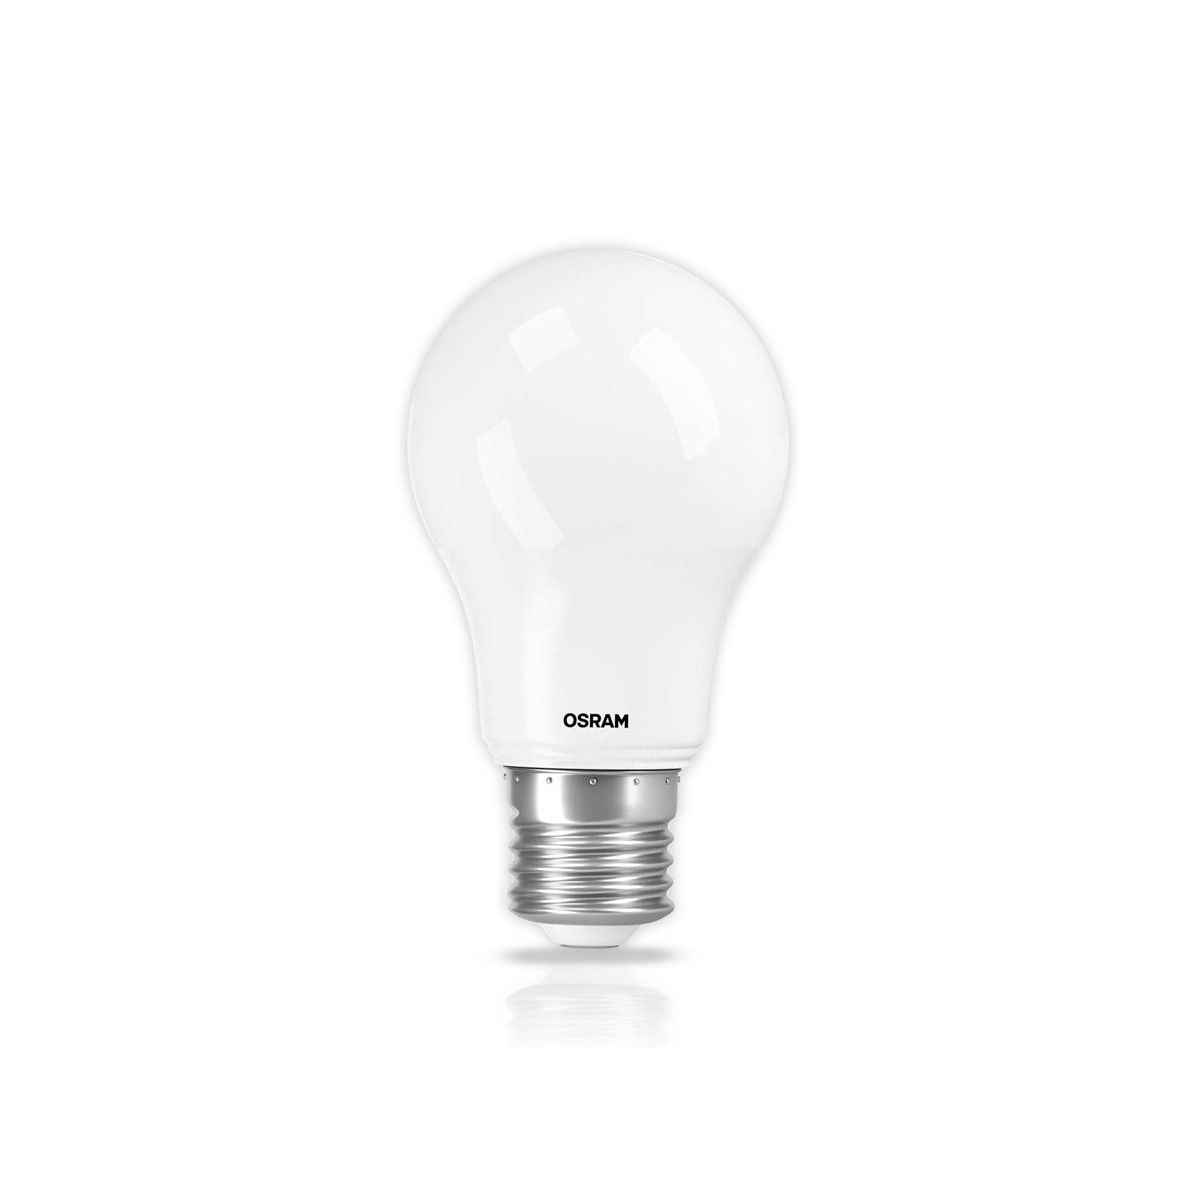 Lâmpada LED SuperStar Bulbo 8W E27 3000K 806 lúmens Bivolt - OSRAM